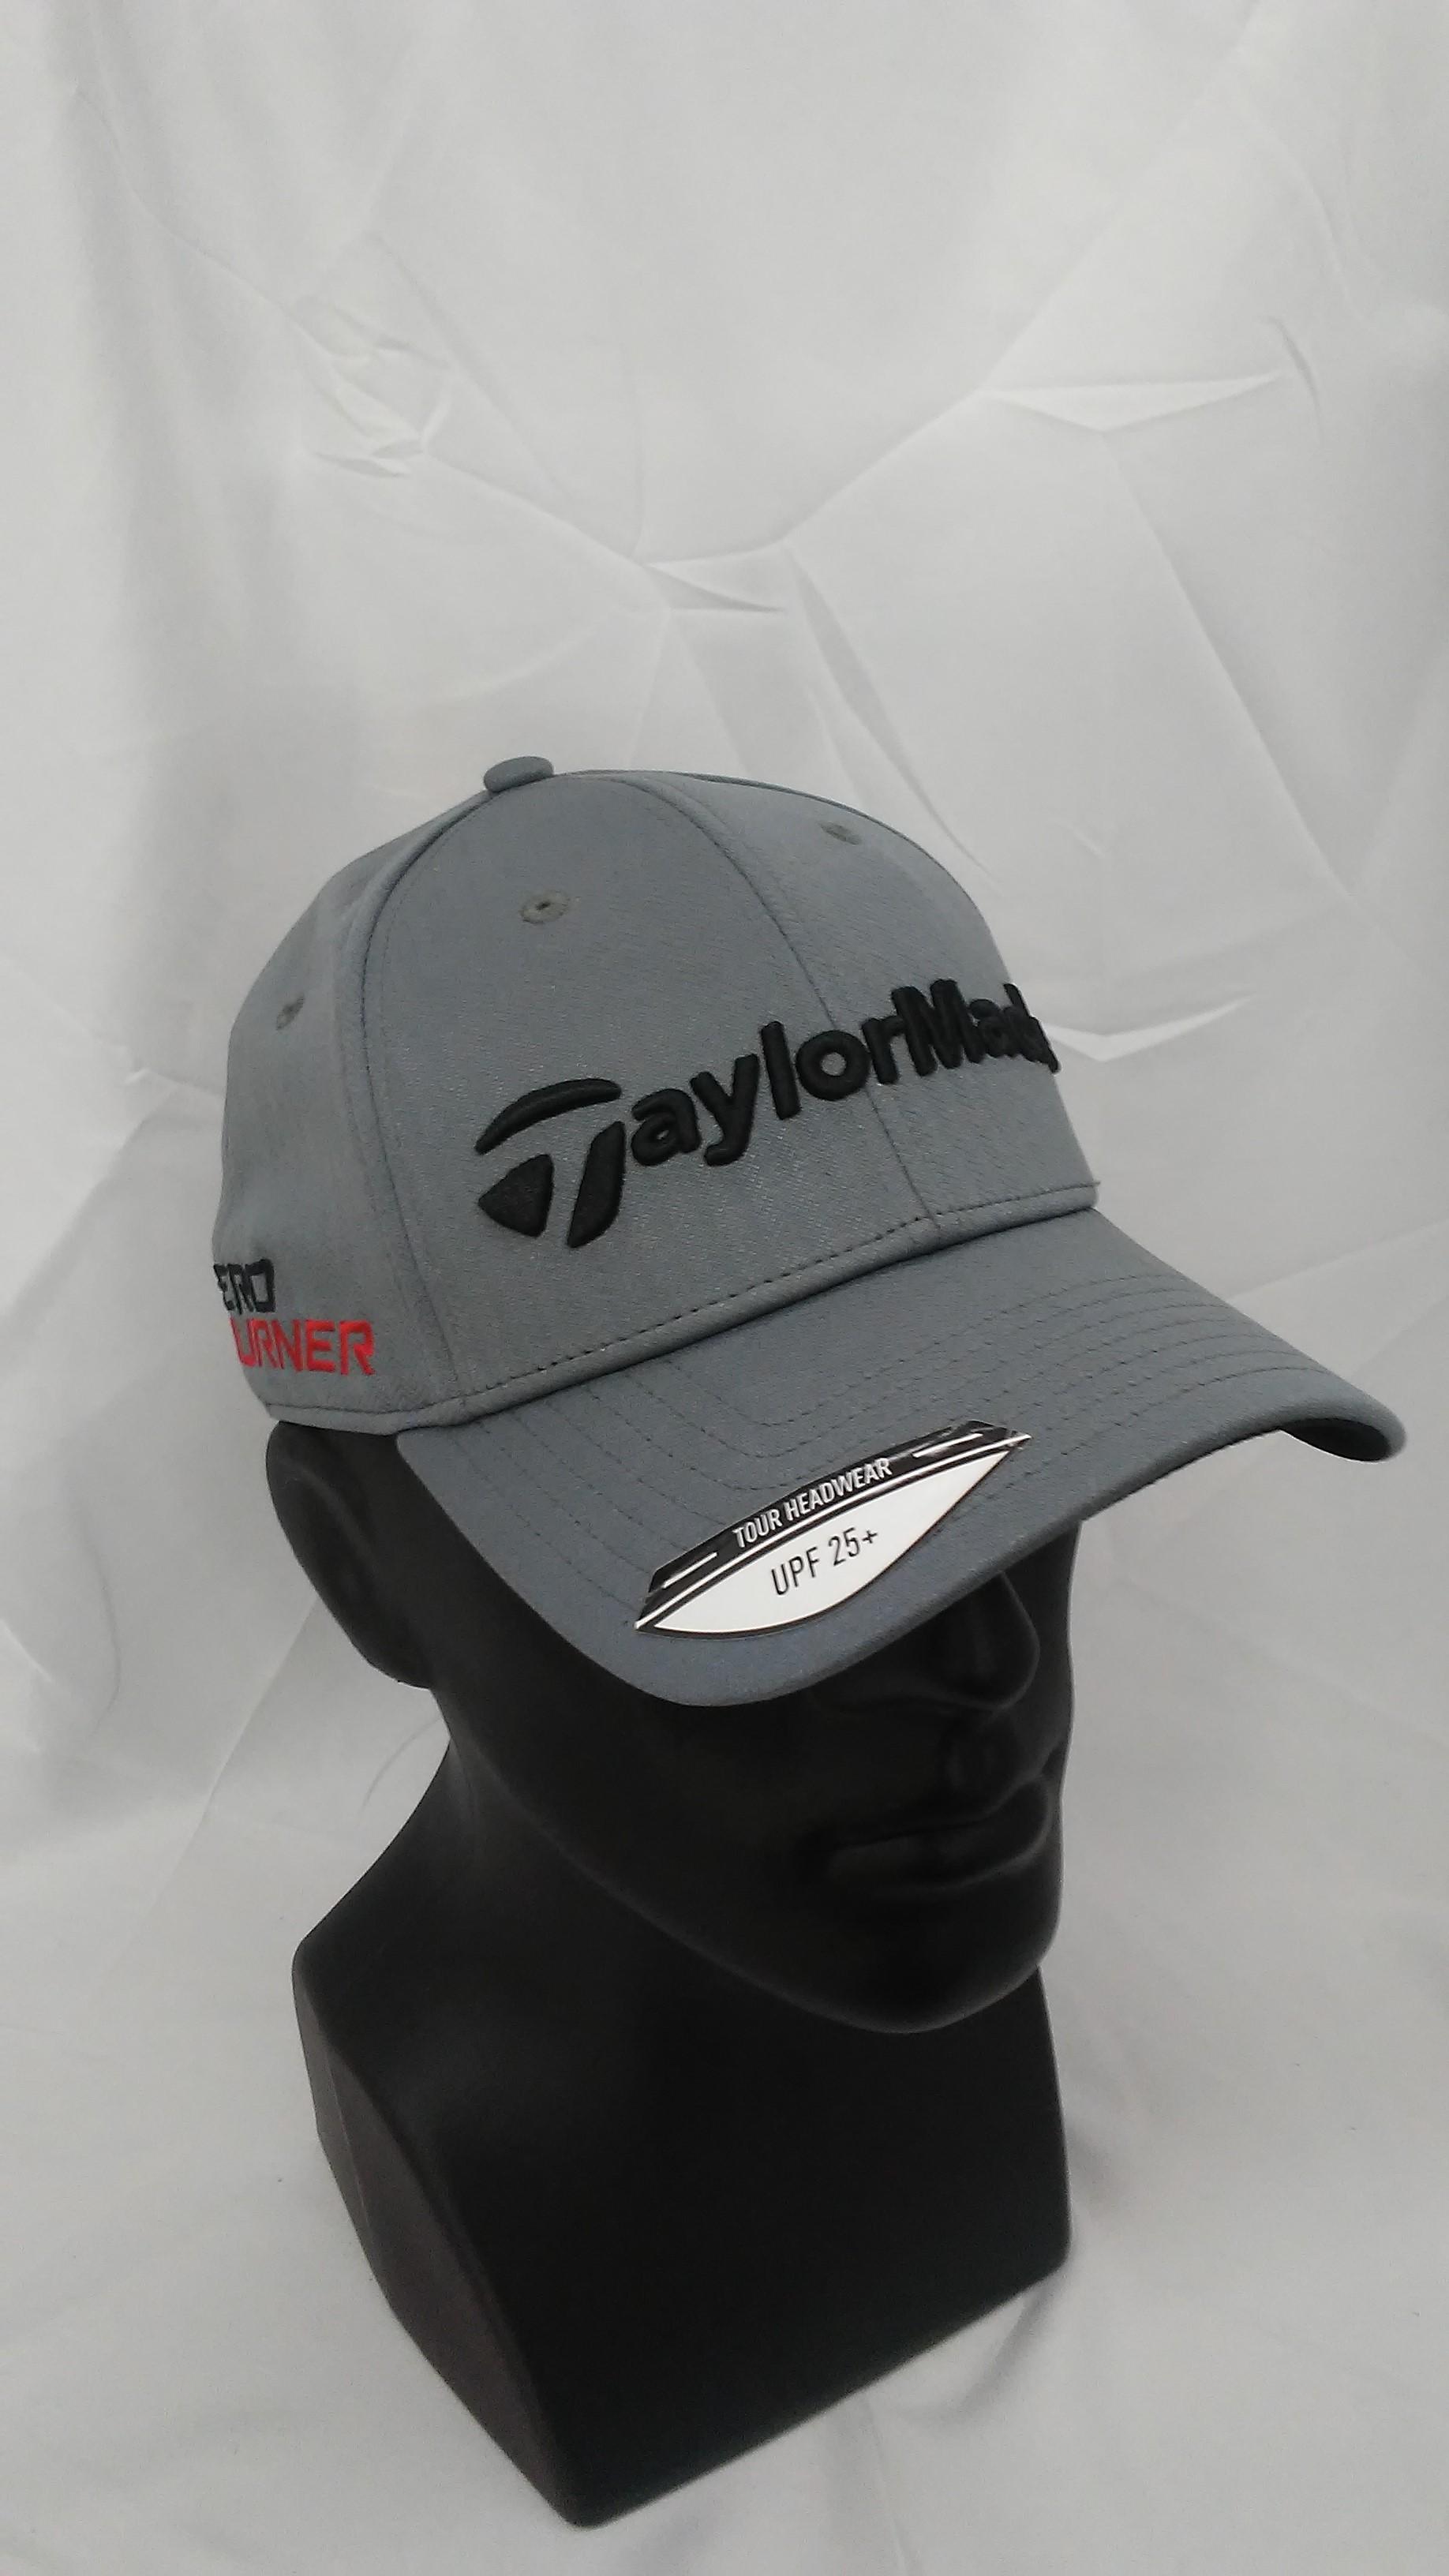 fd839e4c403 Visit our eBay Store for more great deals: Hurricane Golf Men's TaylorMade  Golf Tour Radar Adjustable Hat Grey Aeroburner & R15 Logo BUY IT NOW: 8.99!